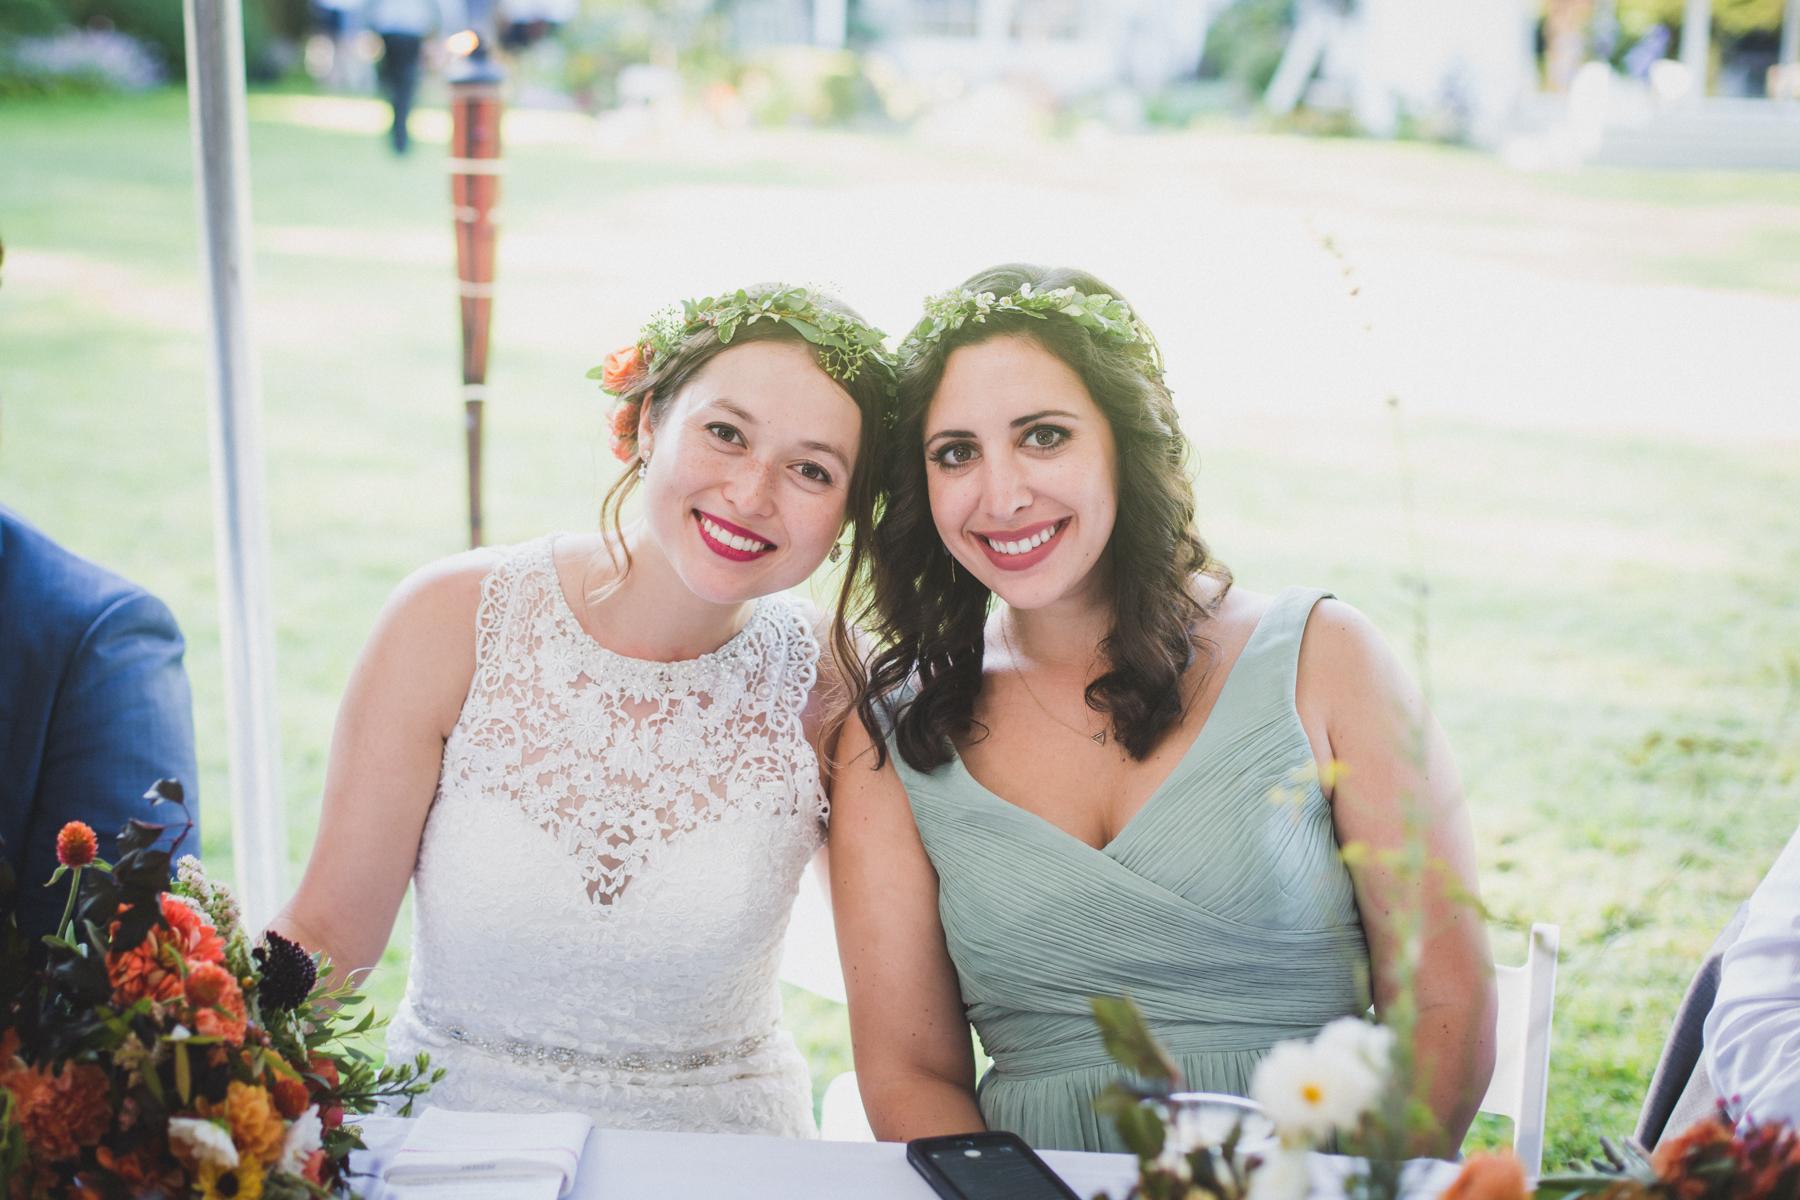 Long-Island-Documentary-Wedding-Photography-Summer-Tent-Wedding-in-New-York-106.jpg